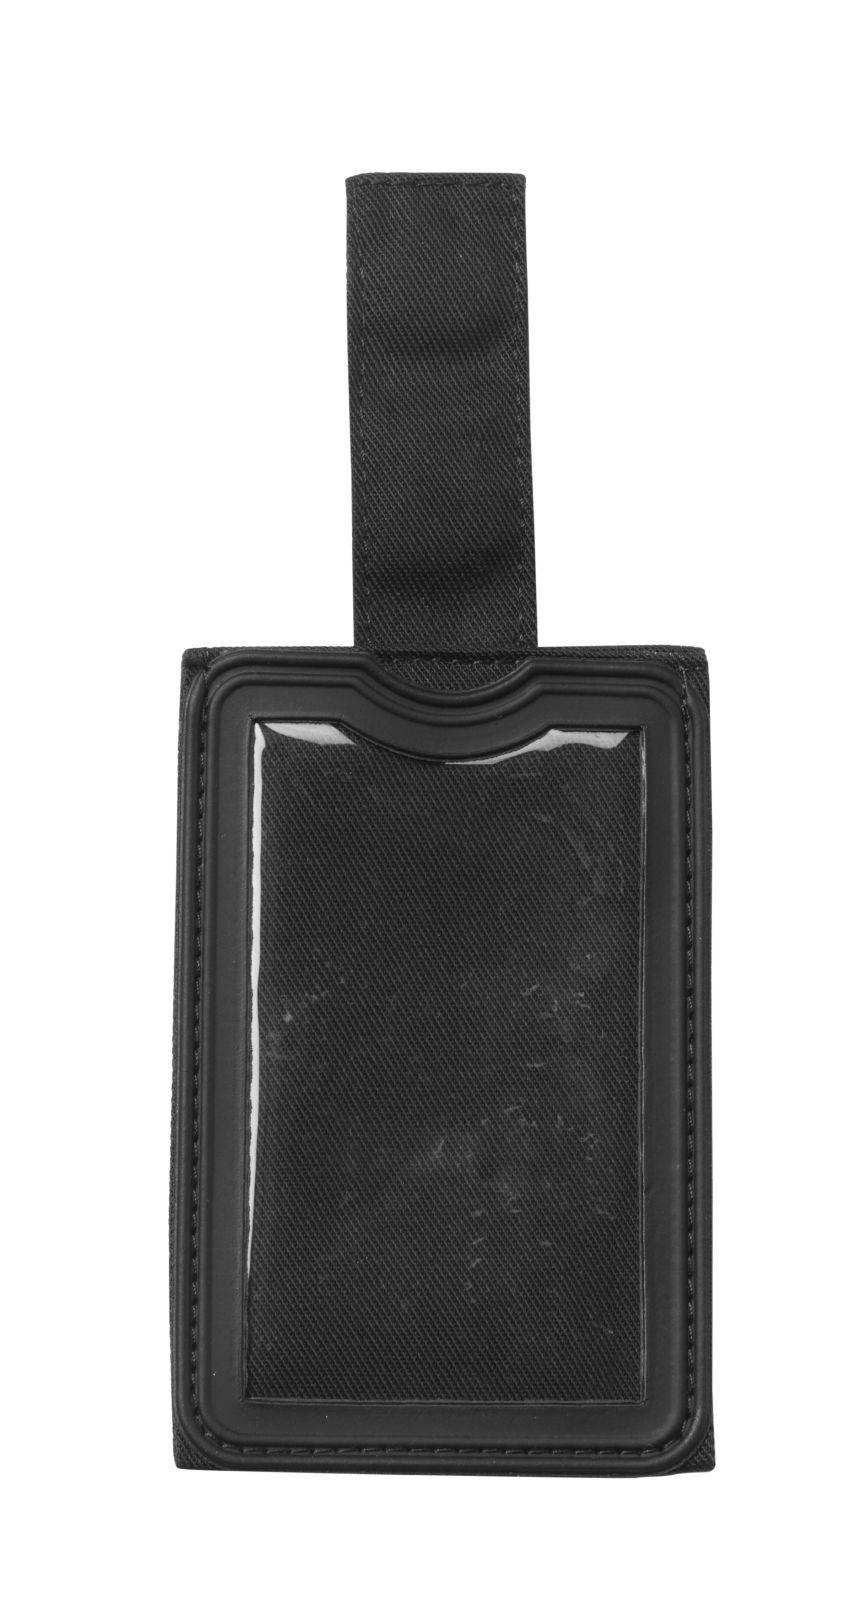 Blaklader ID-kaarthouders 21101800 zwart(9900)